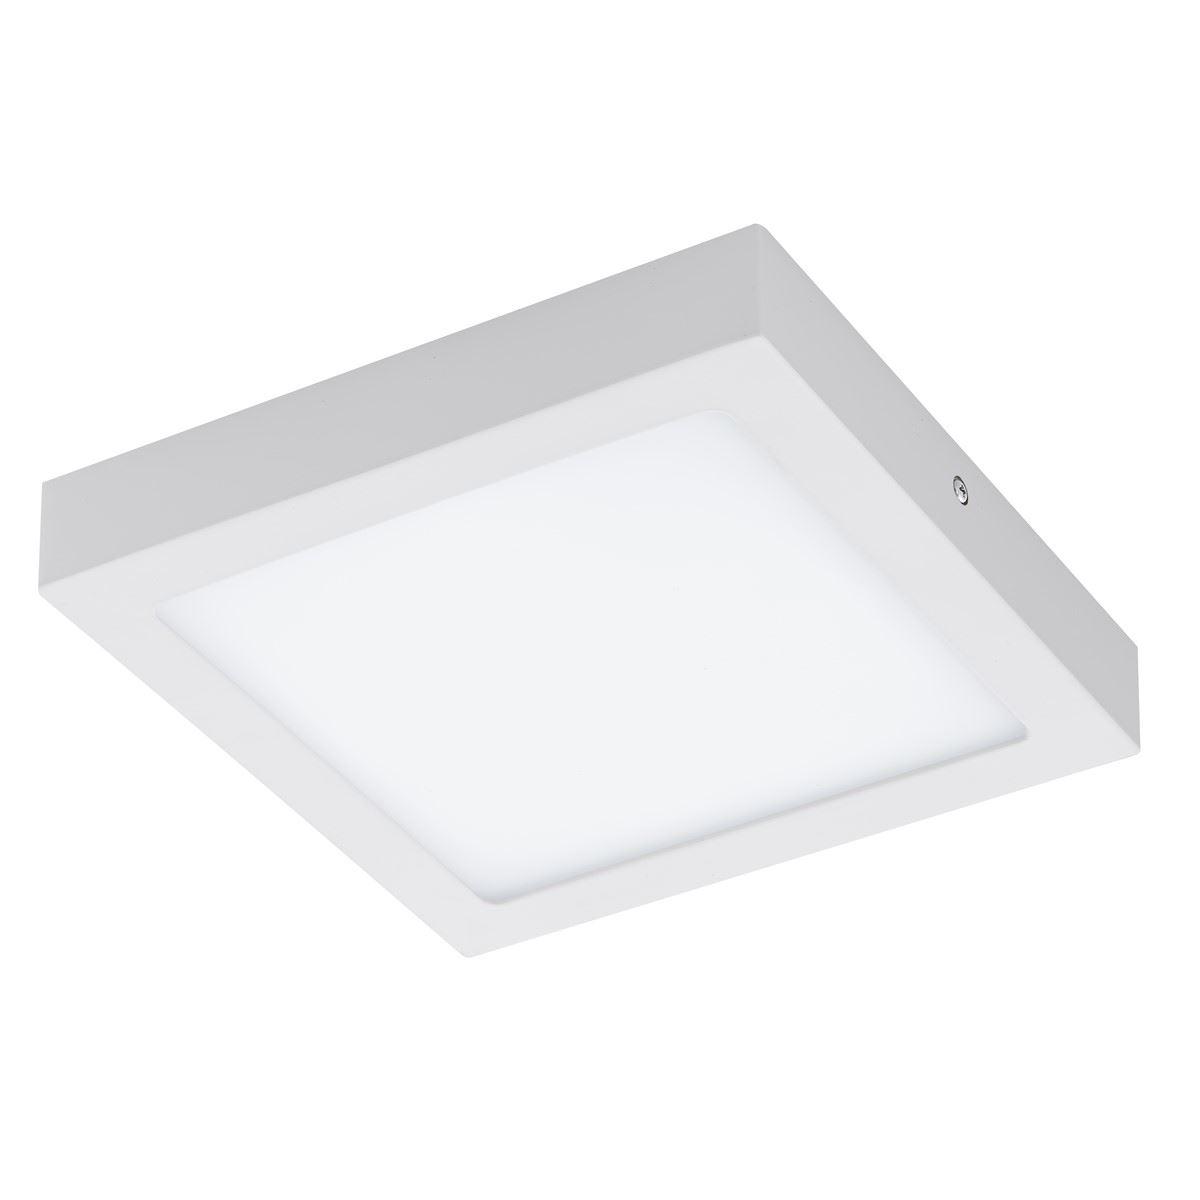 Led Ceiling Recessed White Panel Down Light Lamp 3 Mode Colour White+Rgb/Blue